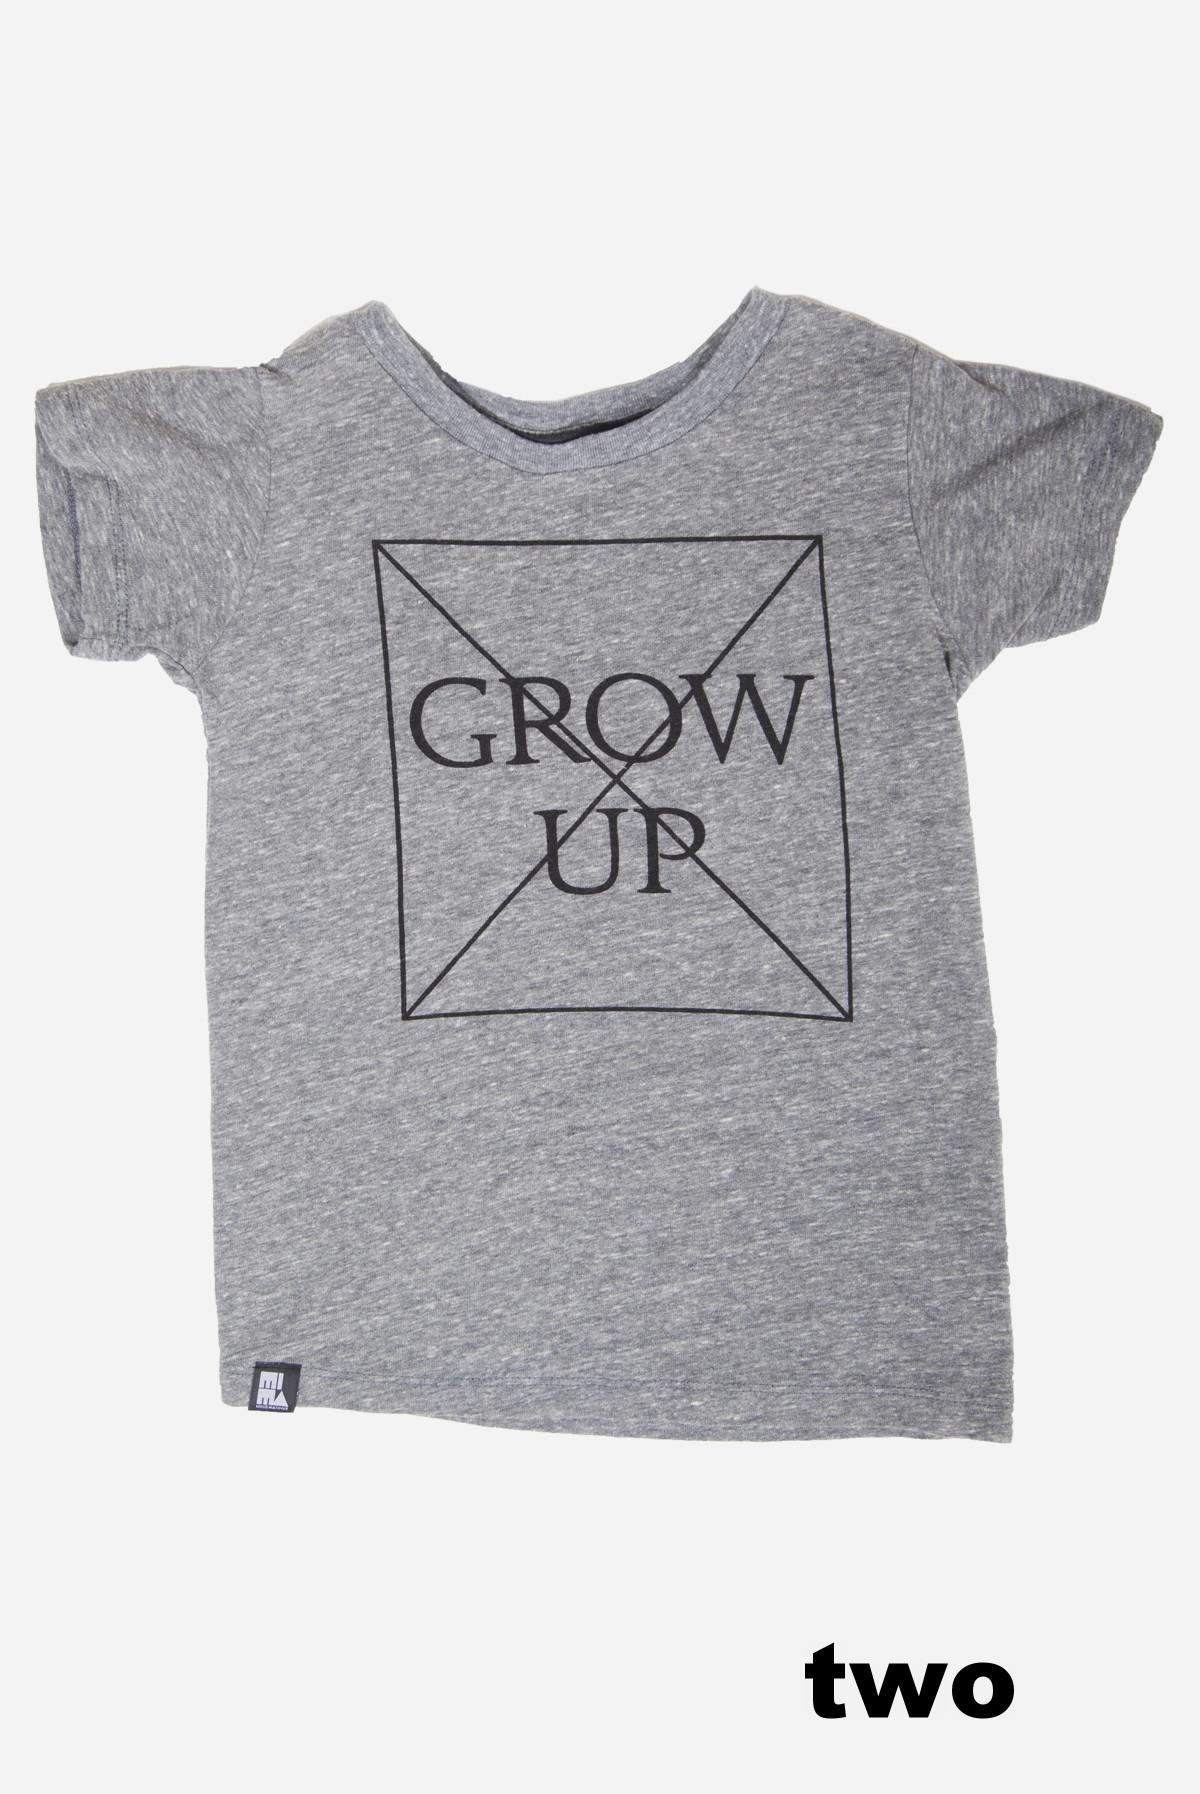 Don_t_Grow_UP_Tee_Grey_small.jpg